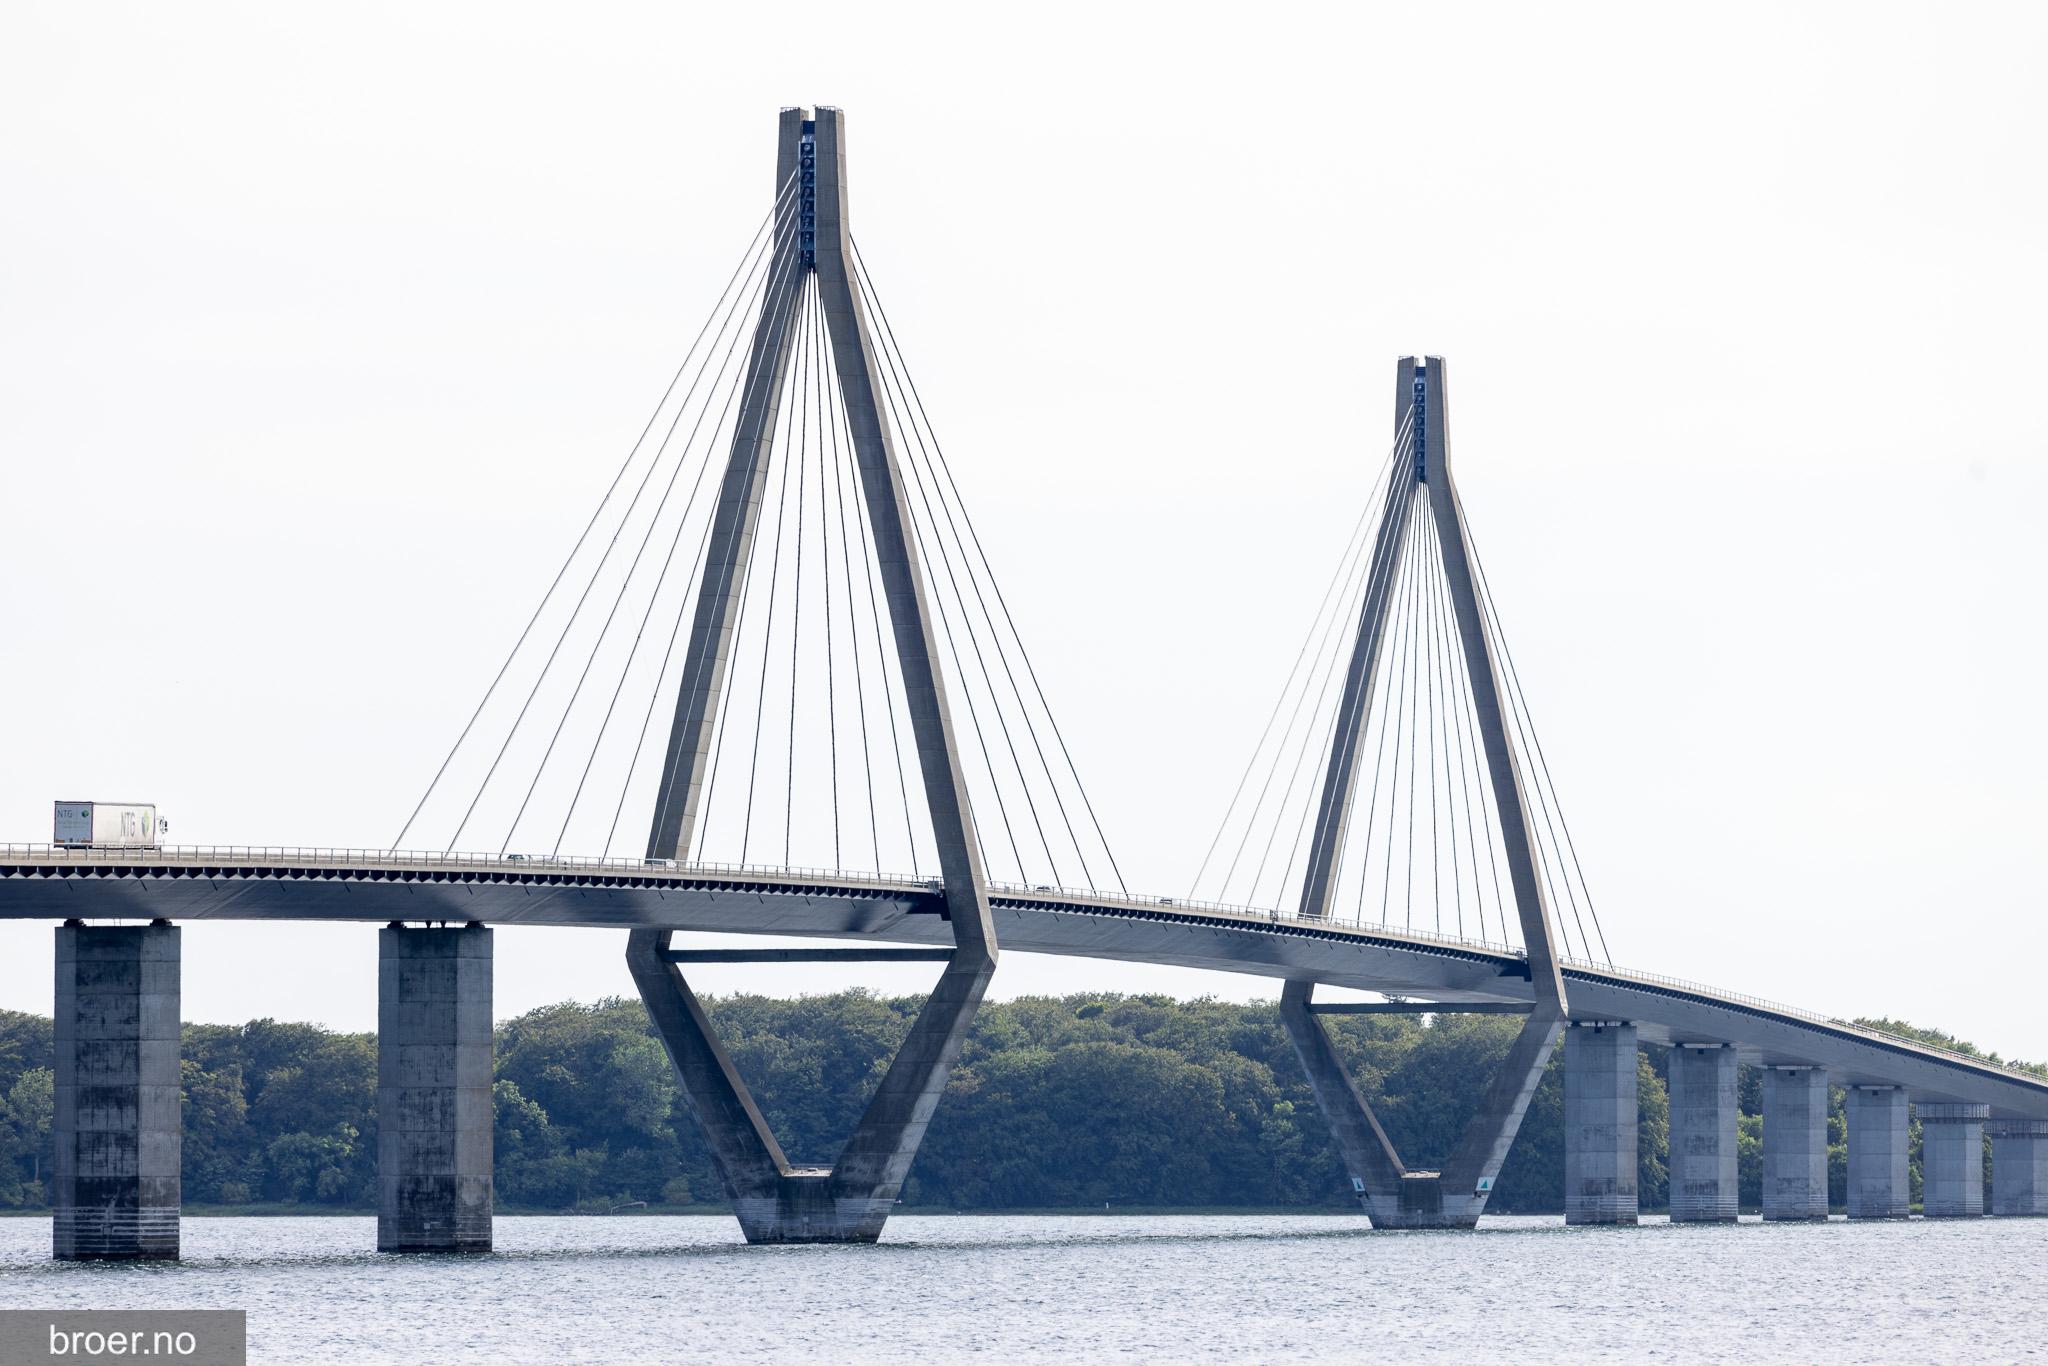 bilde av Farøbroene Høybroen